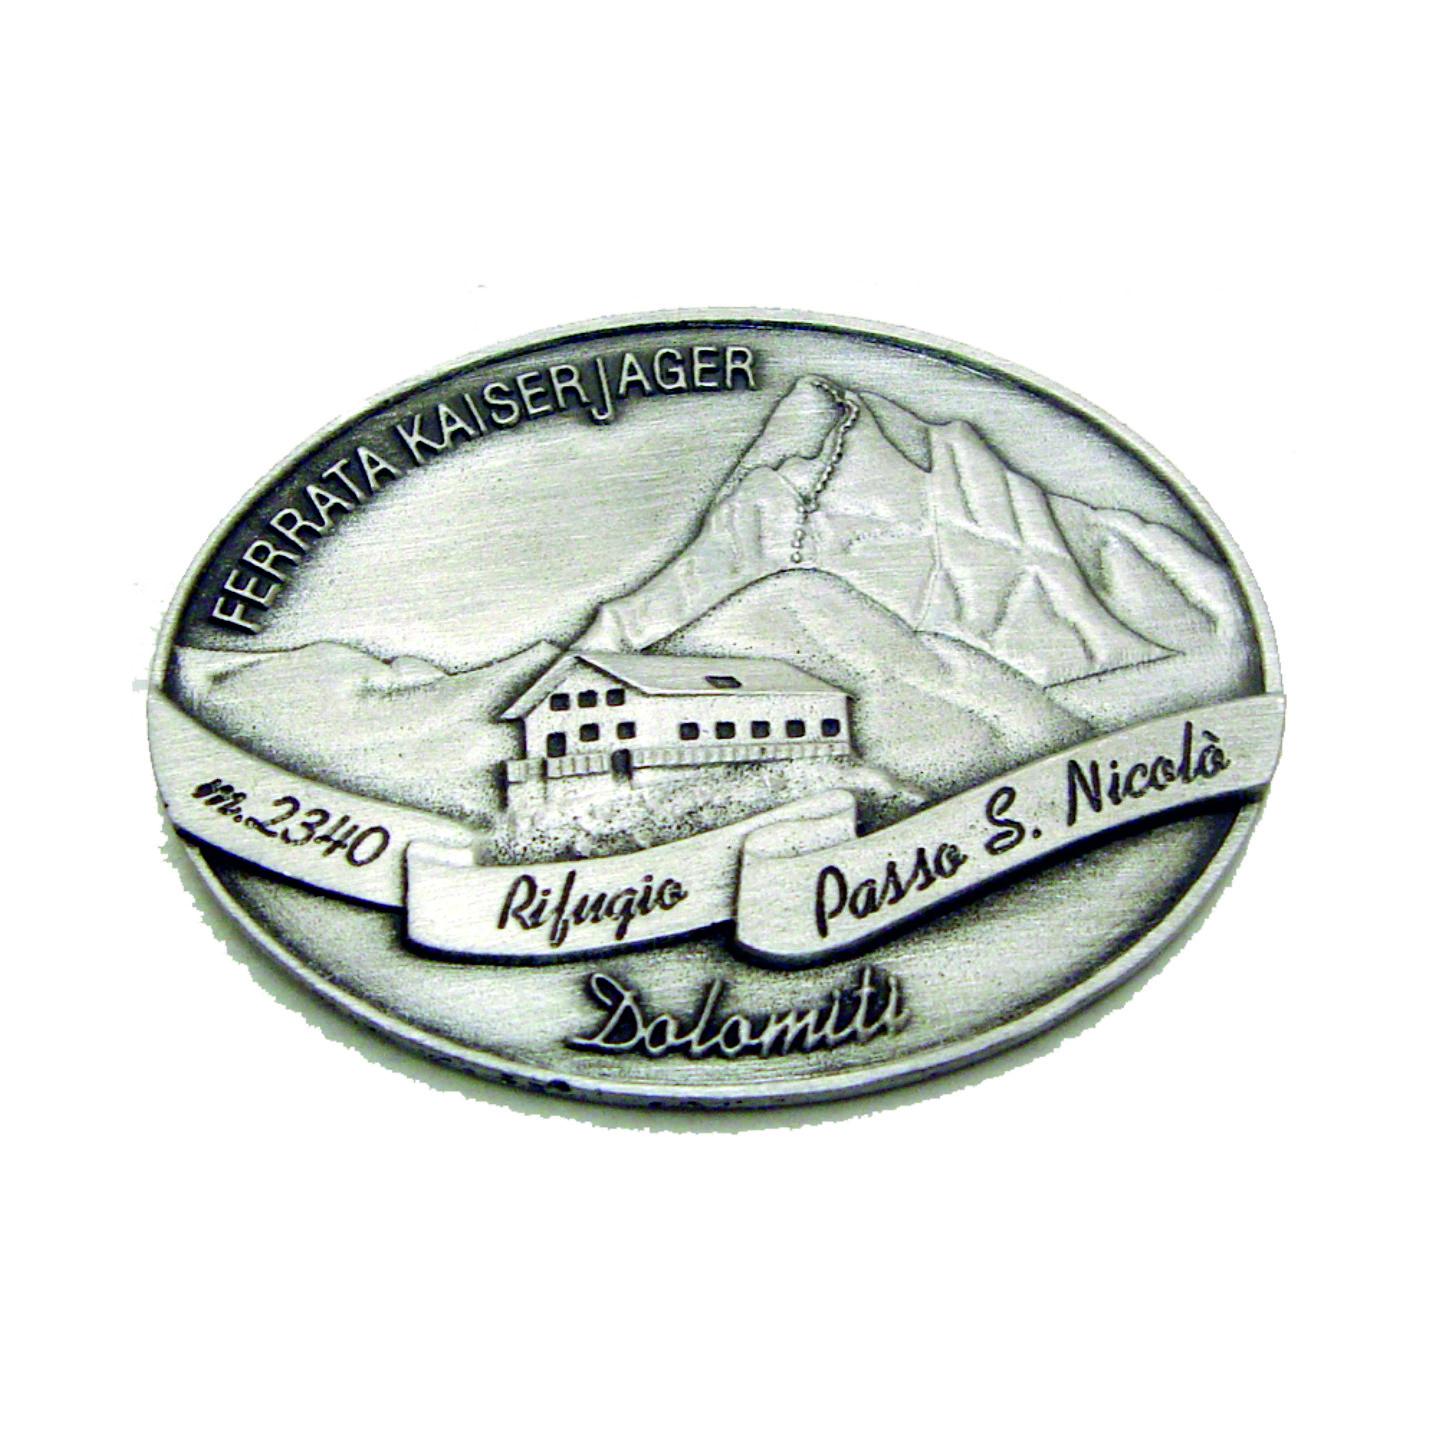 Distintivo per bastone Rifugio Passo S. Nicolò